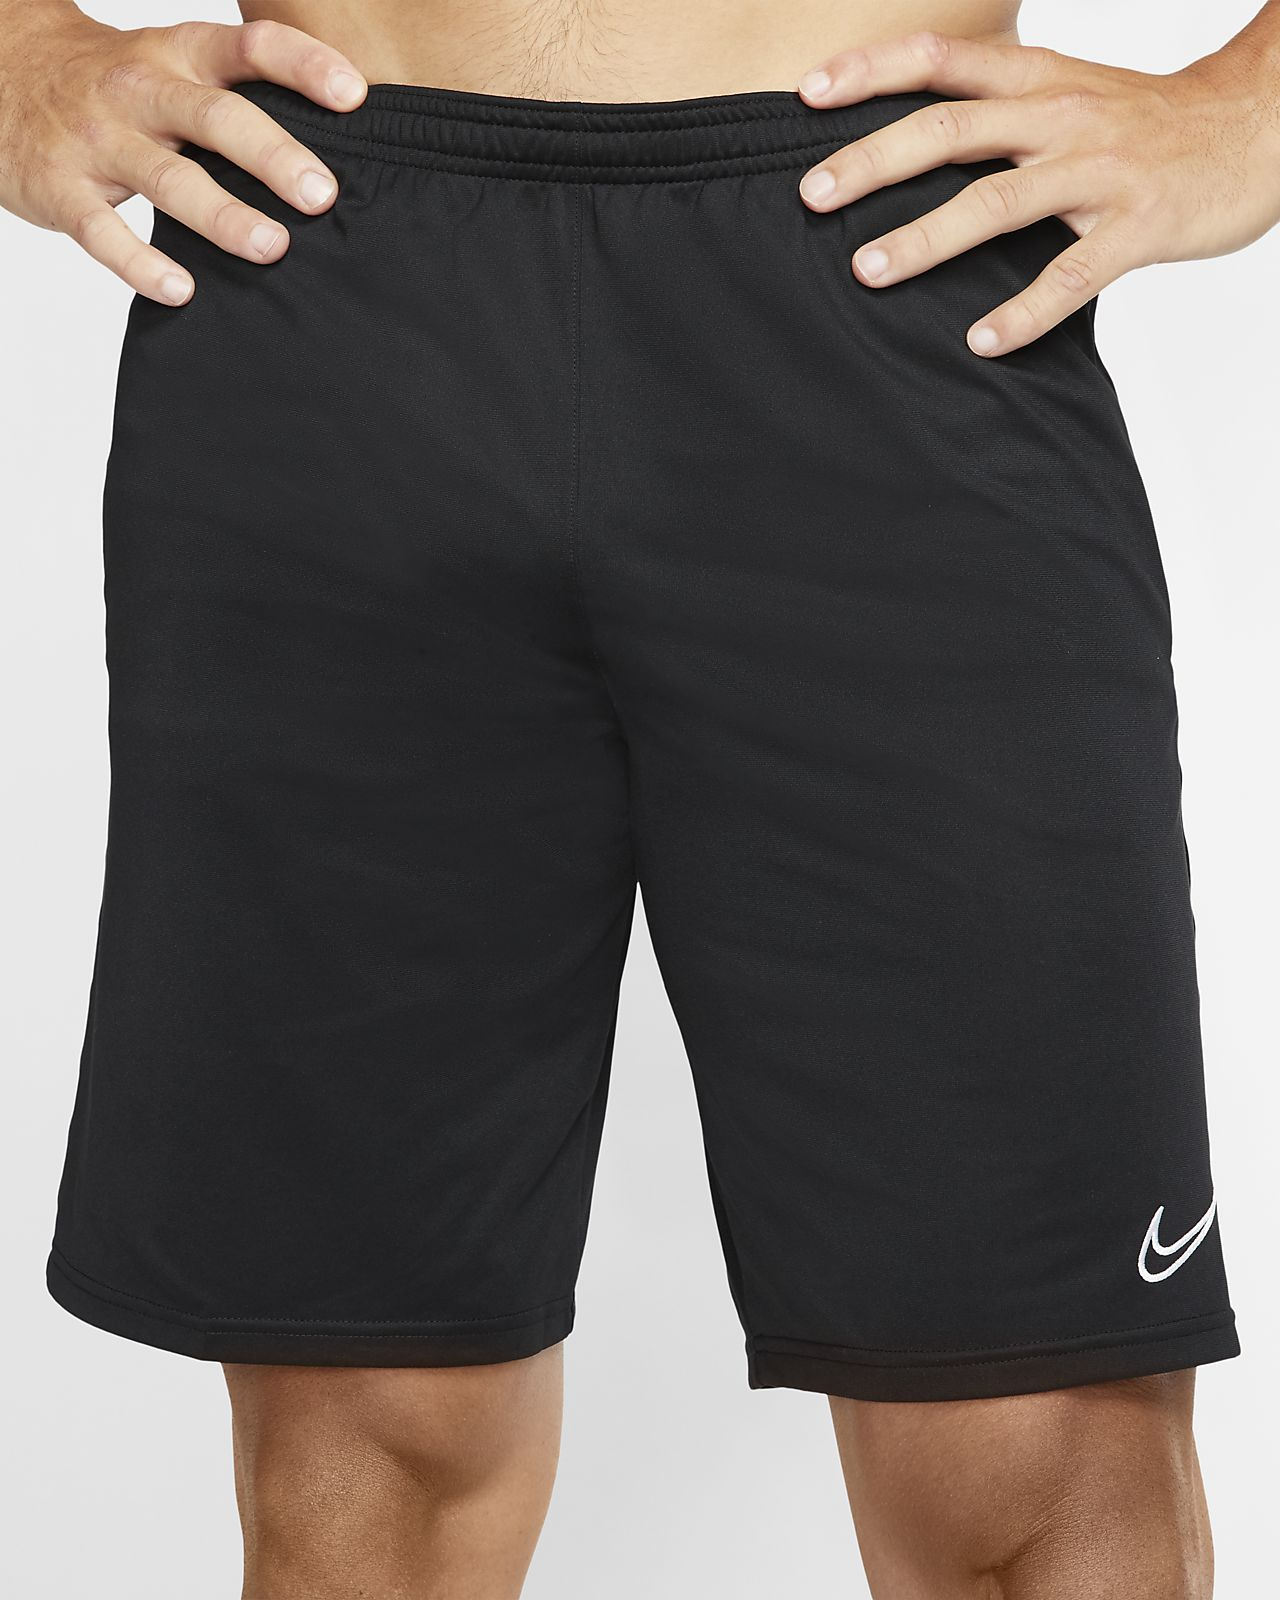 Nike Dri-FIT Academy Pantalón corto de fútbol - Hombre